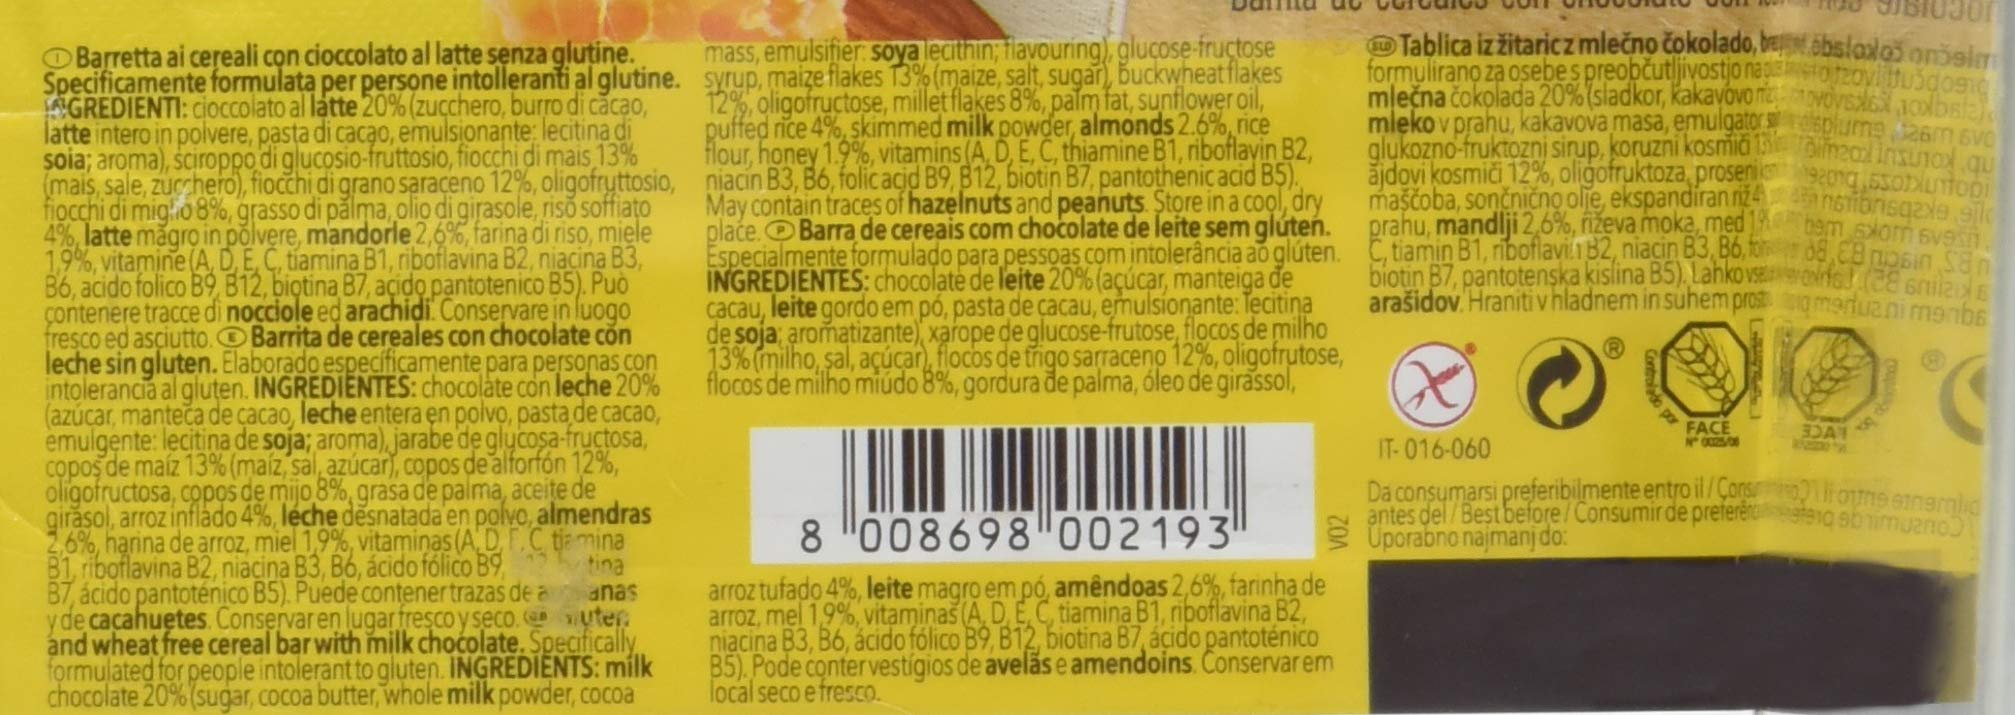 Dr.Schär Cereal Bar - Pacco da 25 x 25 g, Senza glutine 3 spesavip